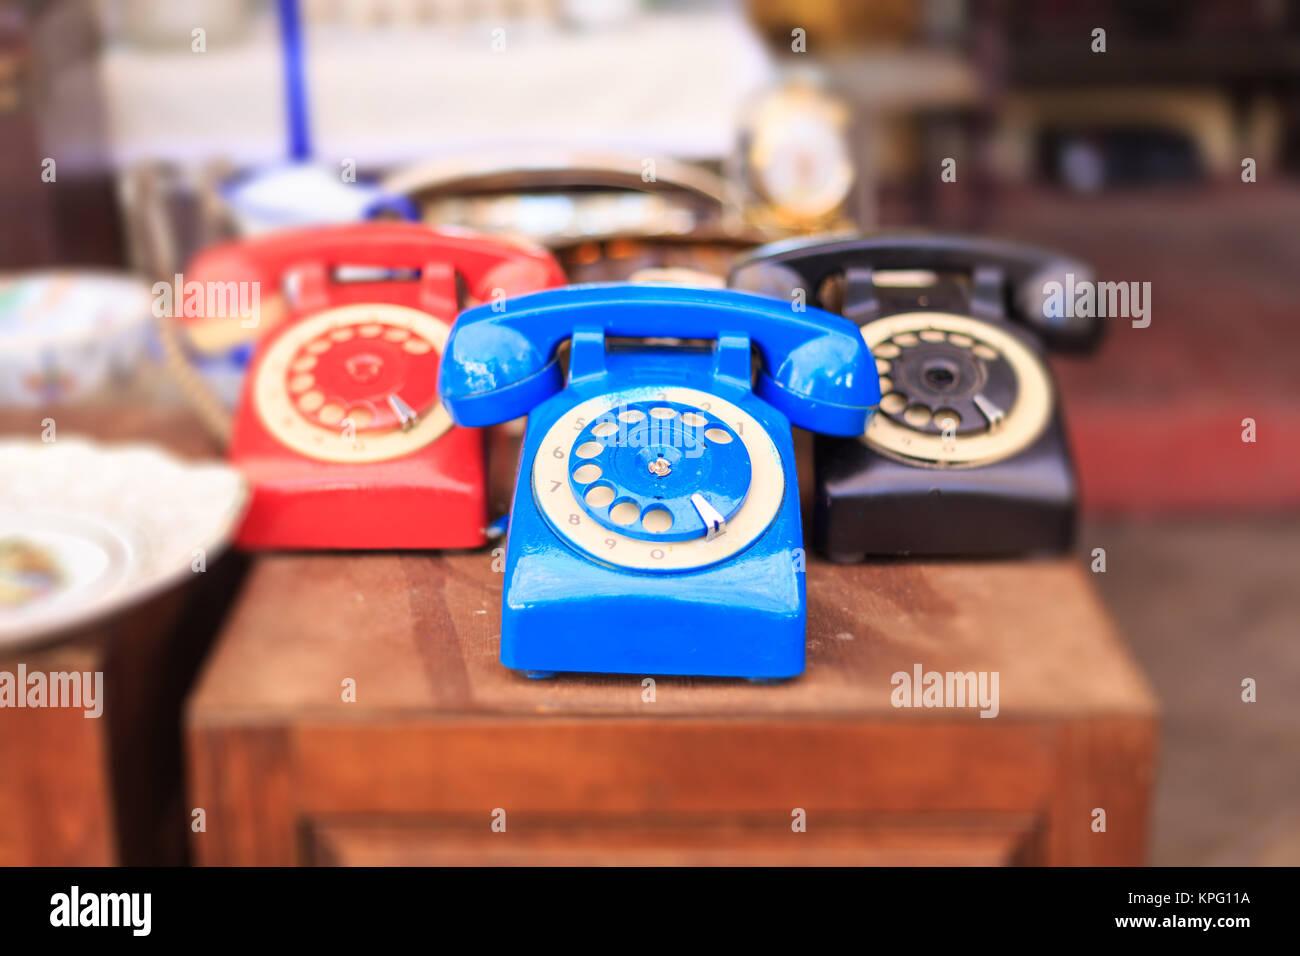 Athens, Greece. Vintage telephones collection at Monastiraki, an open air flea market - Stock Image